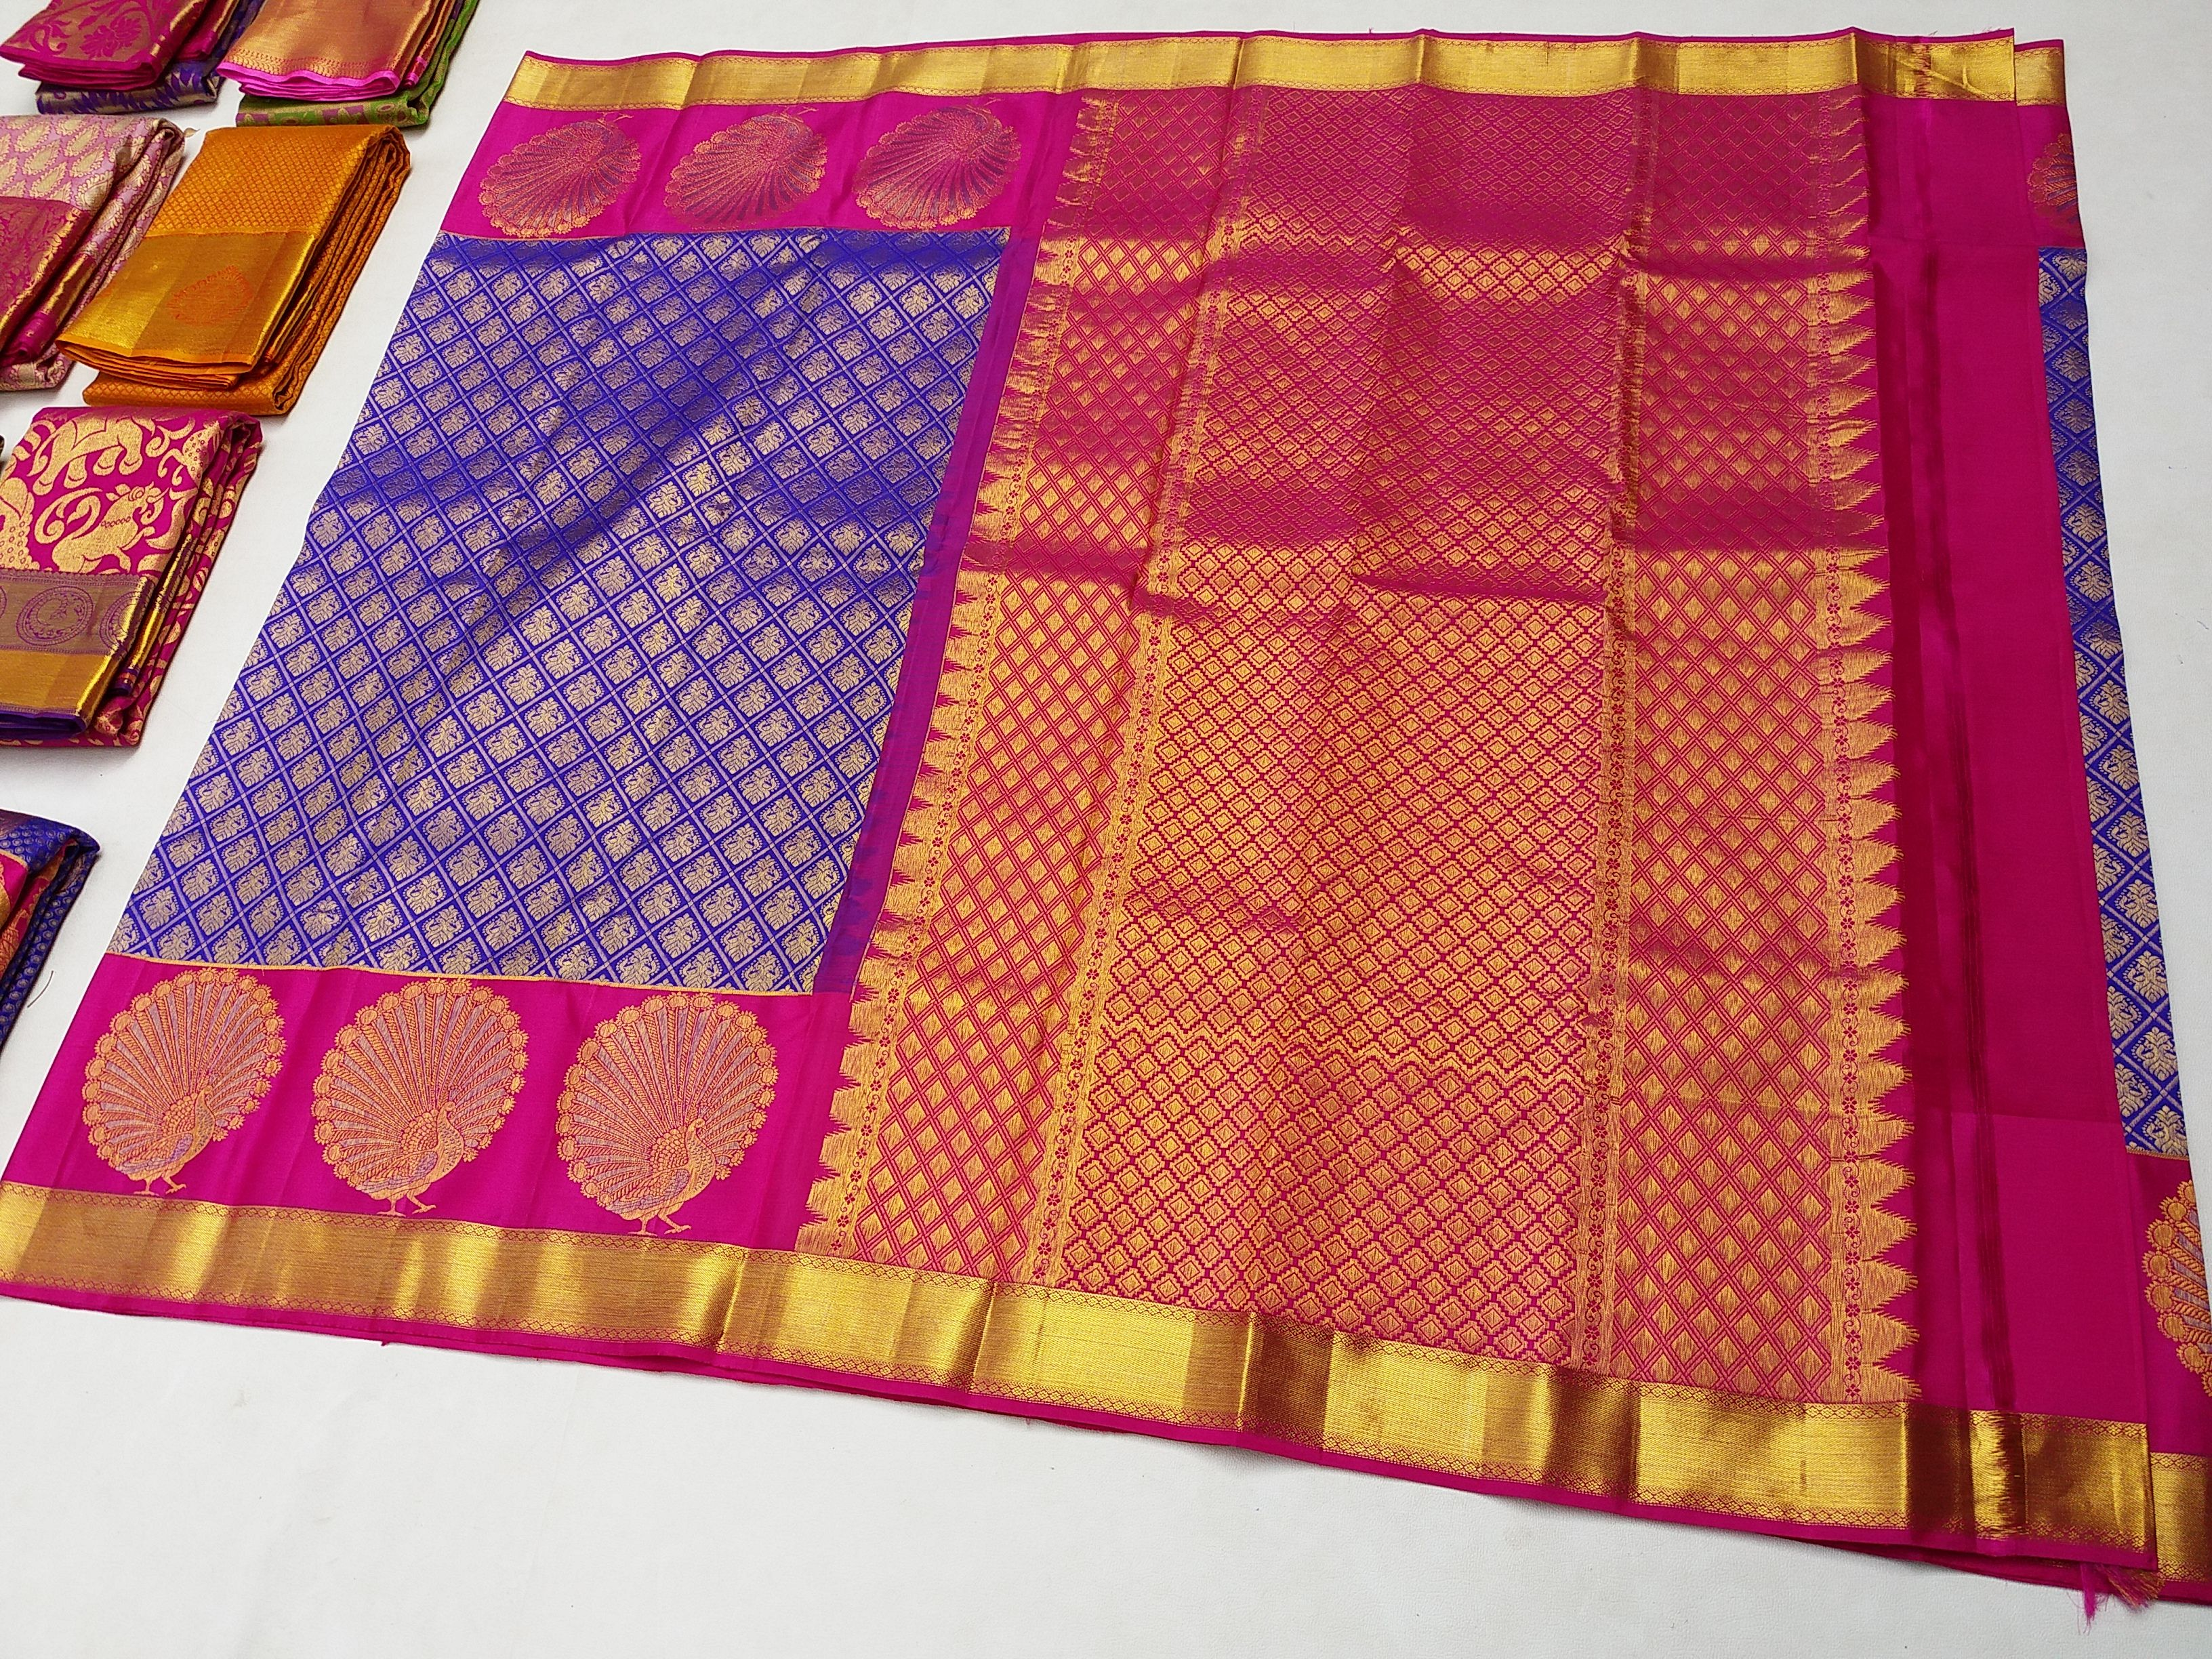 0141ca9d0f Sri Sarvalakshmi Silks Saree Manufacture & Wholesale Supplier kanchipuram  pure handloom fancy silk saree Original kancheepuram Silk Sarees  Manufacturers and ...